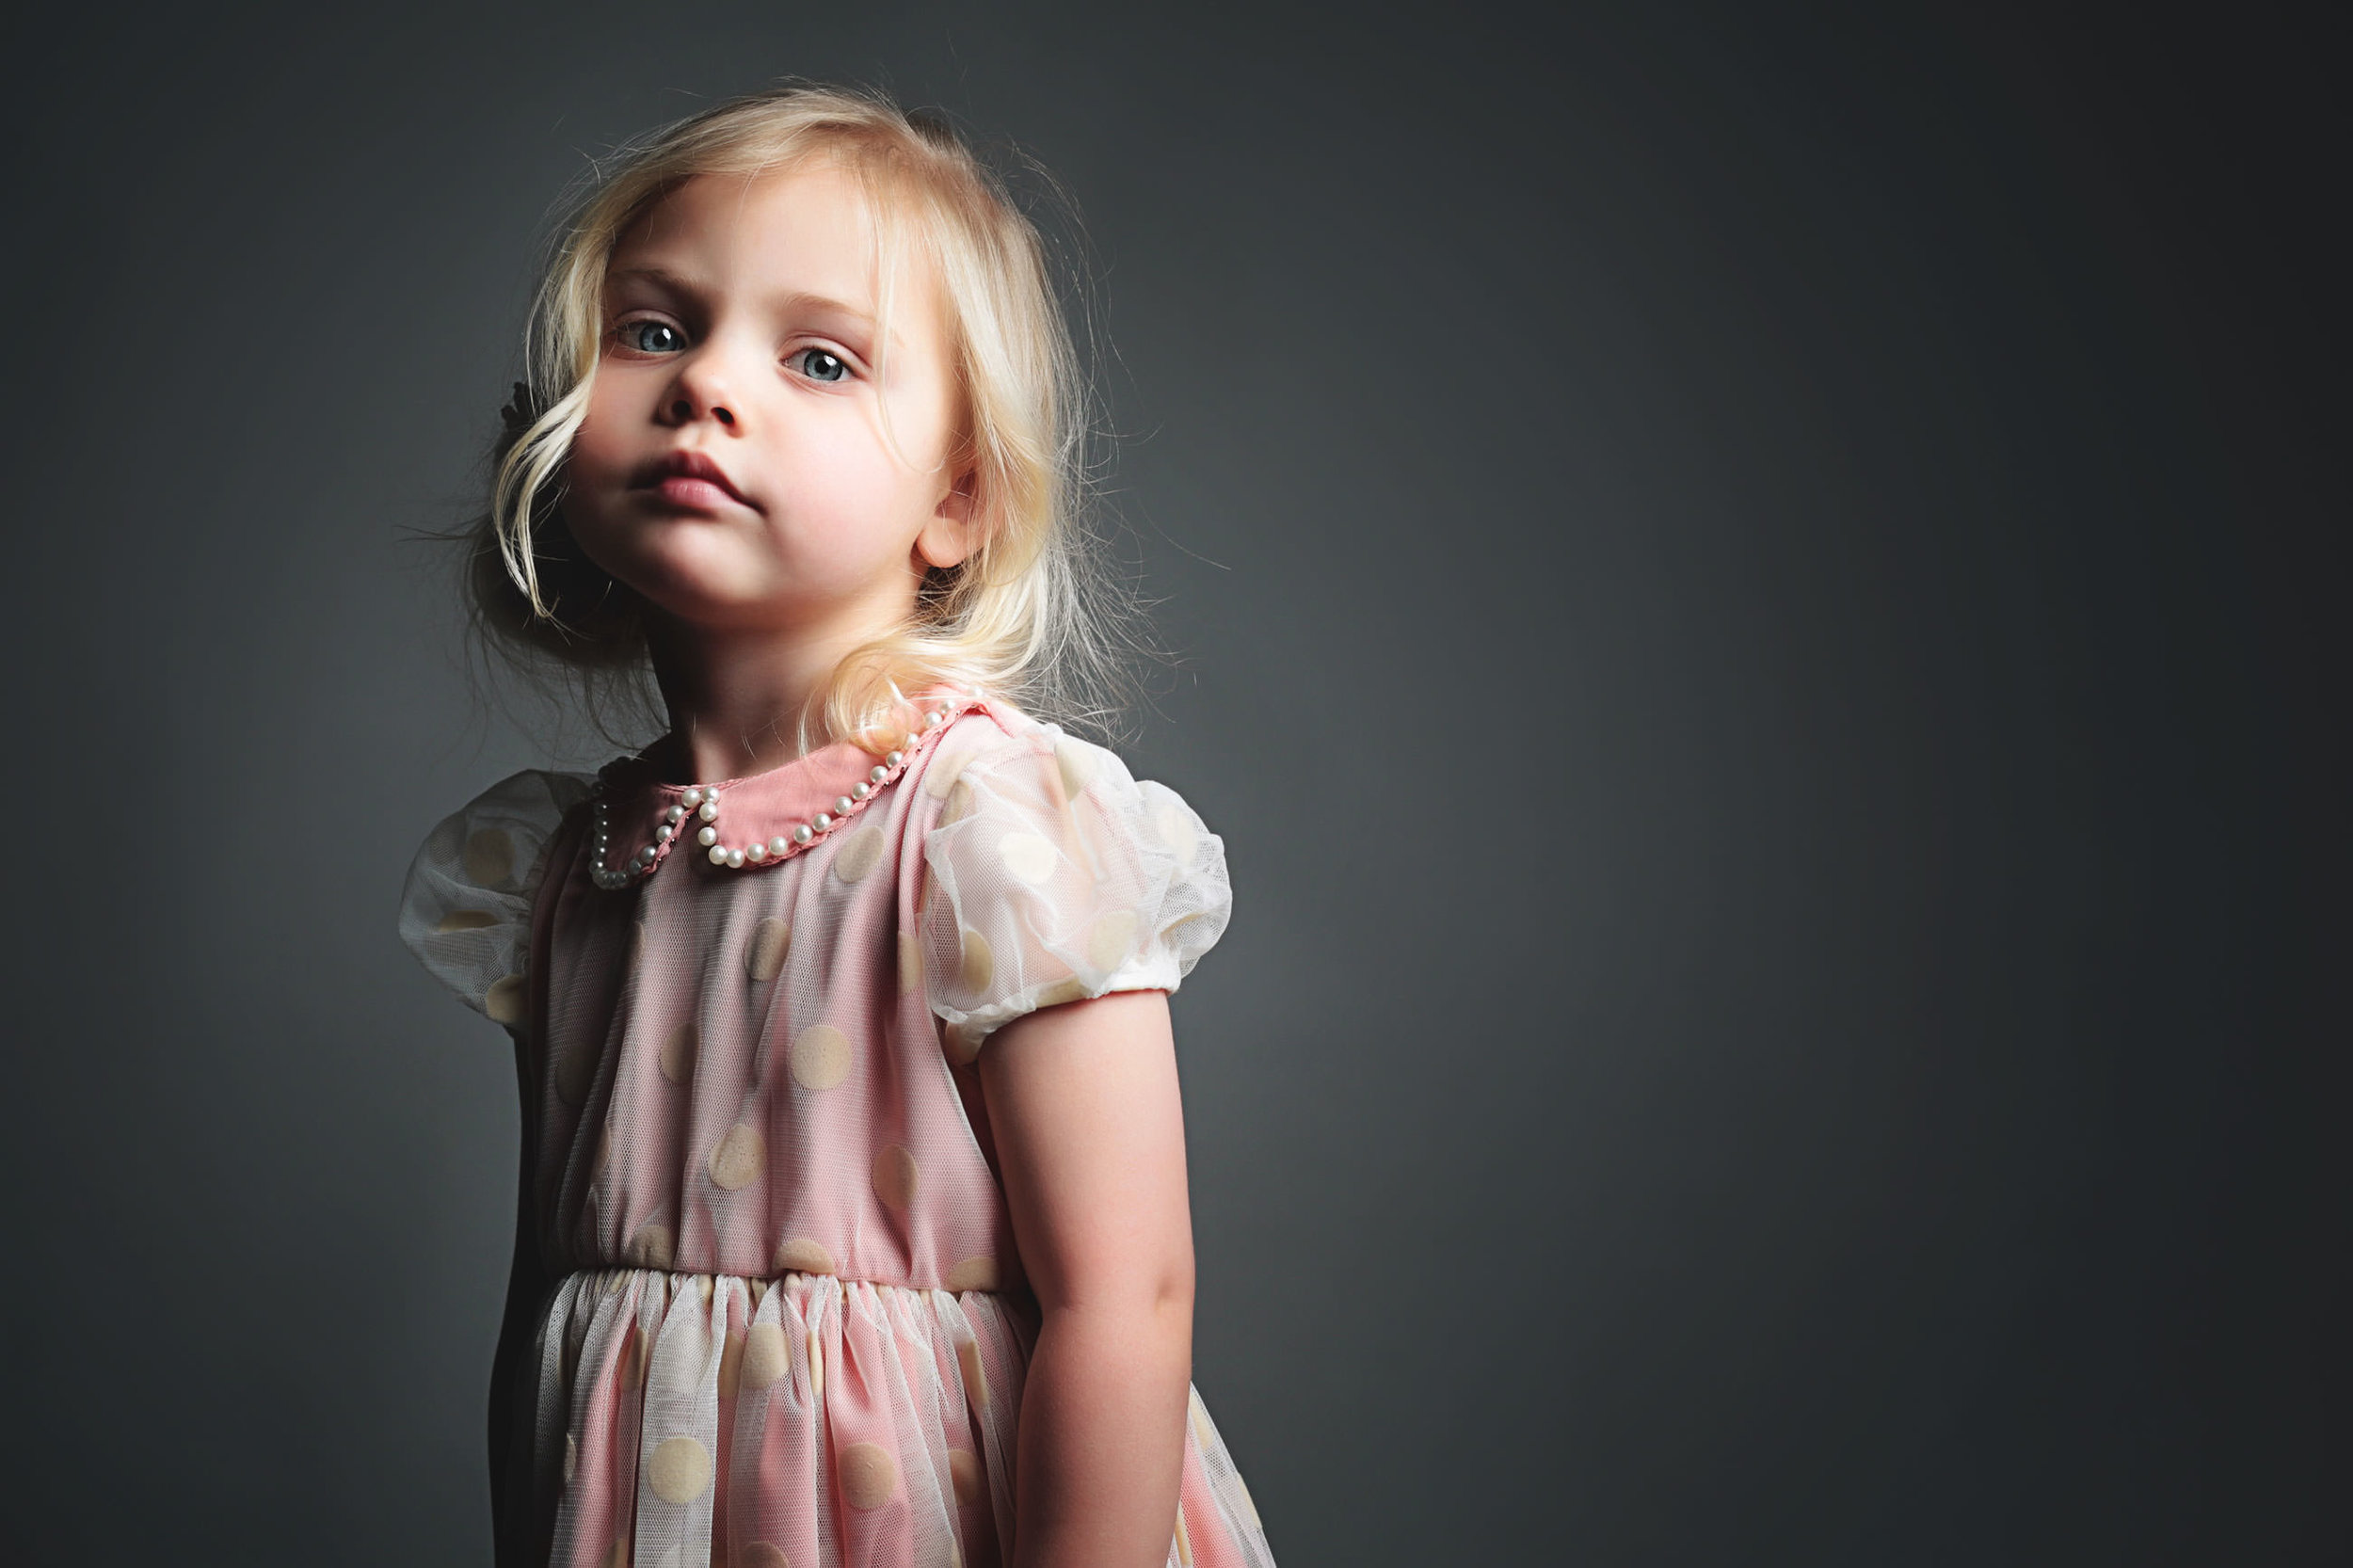 arkansas_children_child_portrait-029.jpg